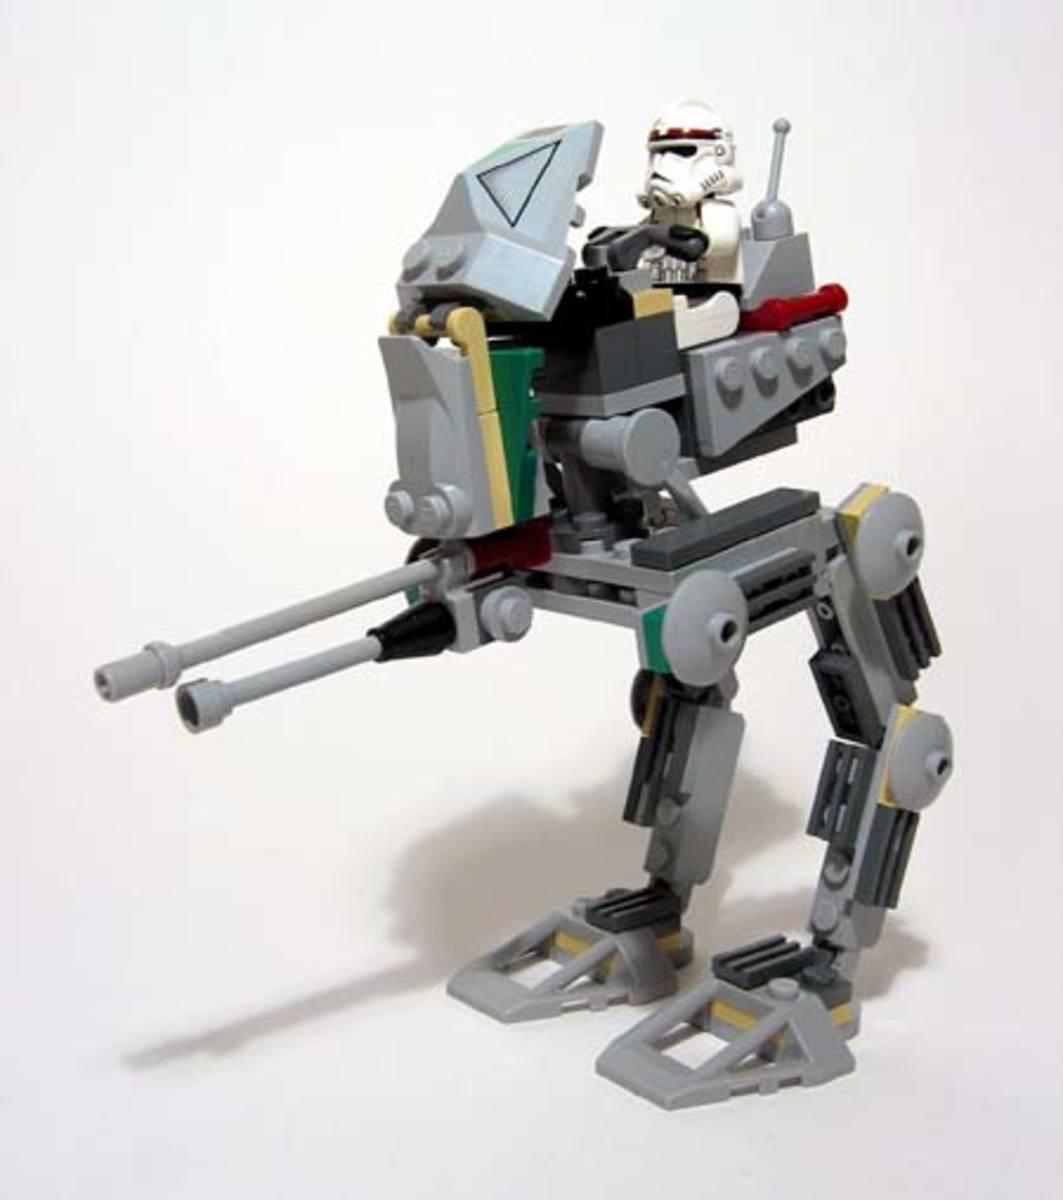 LEGO Star Wars Clone Scout Walker 7250 Assembled